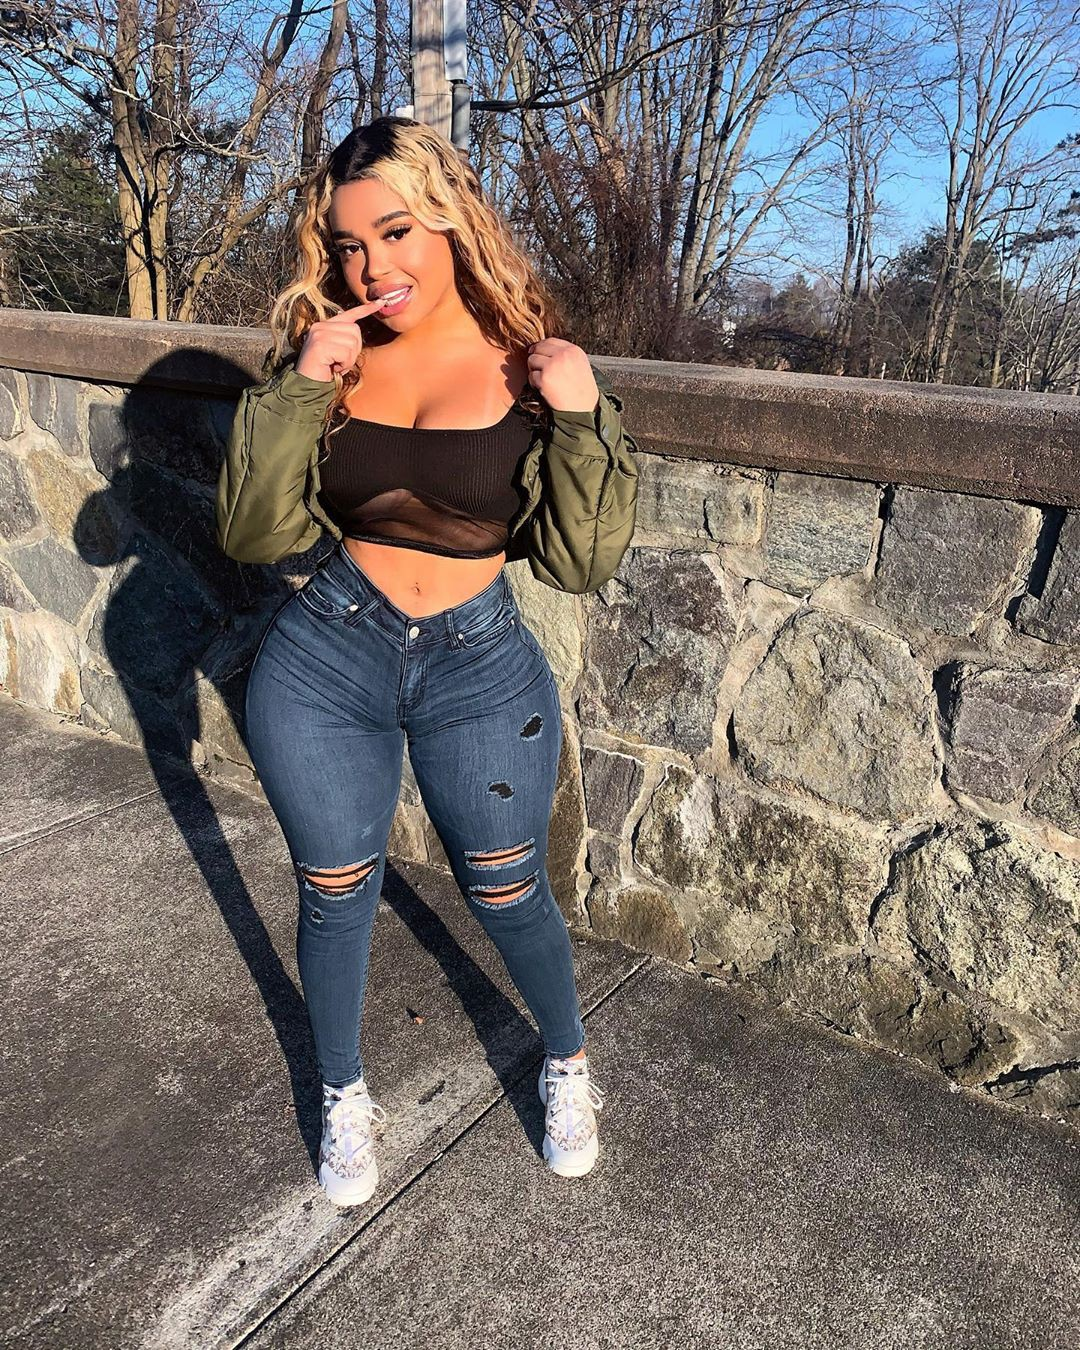 Giselle Lynette trousers, denim, jeans matching ideas for girls